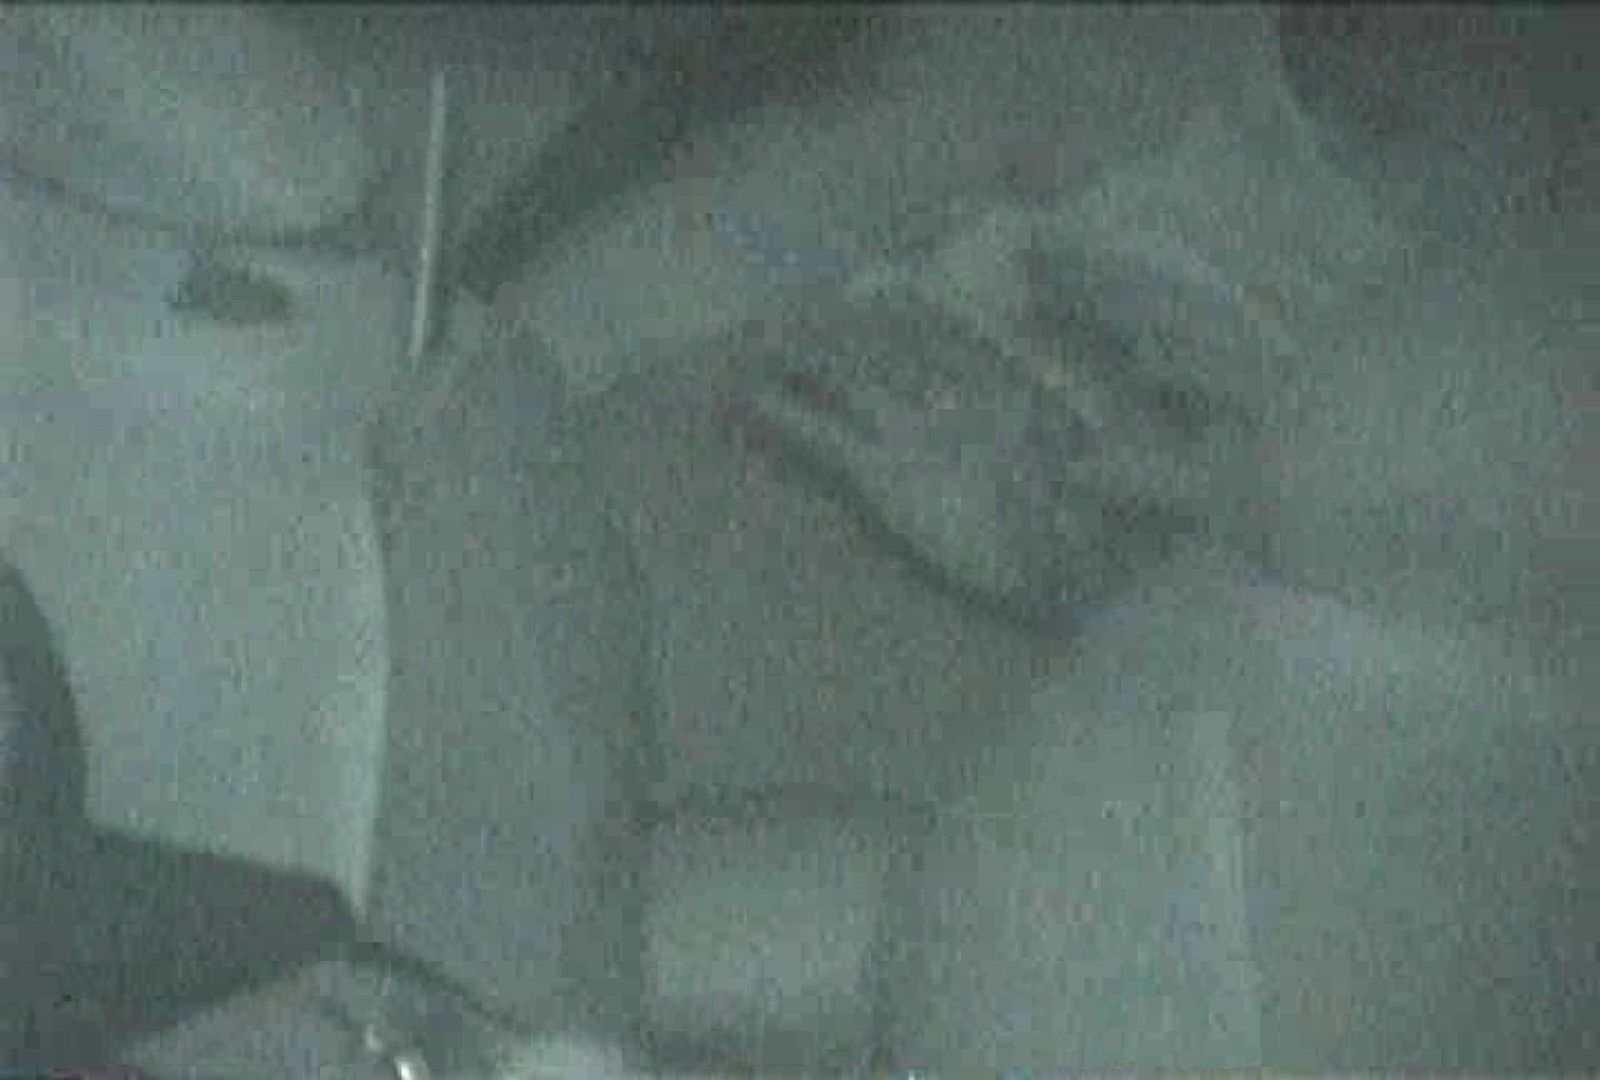 充血監督の深夜の運動会Vol.99 美女OL オメコ無修正動画無料 67連発 58